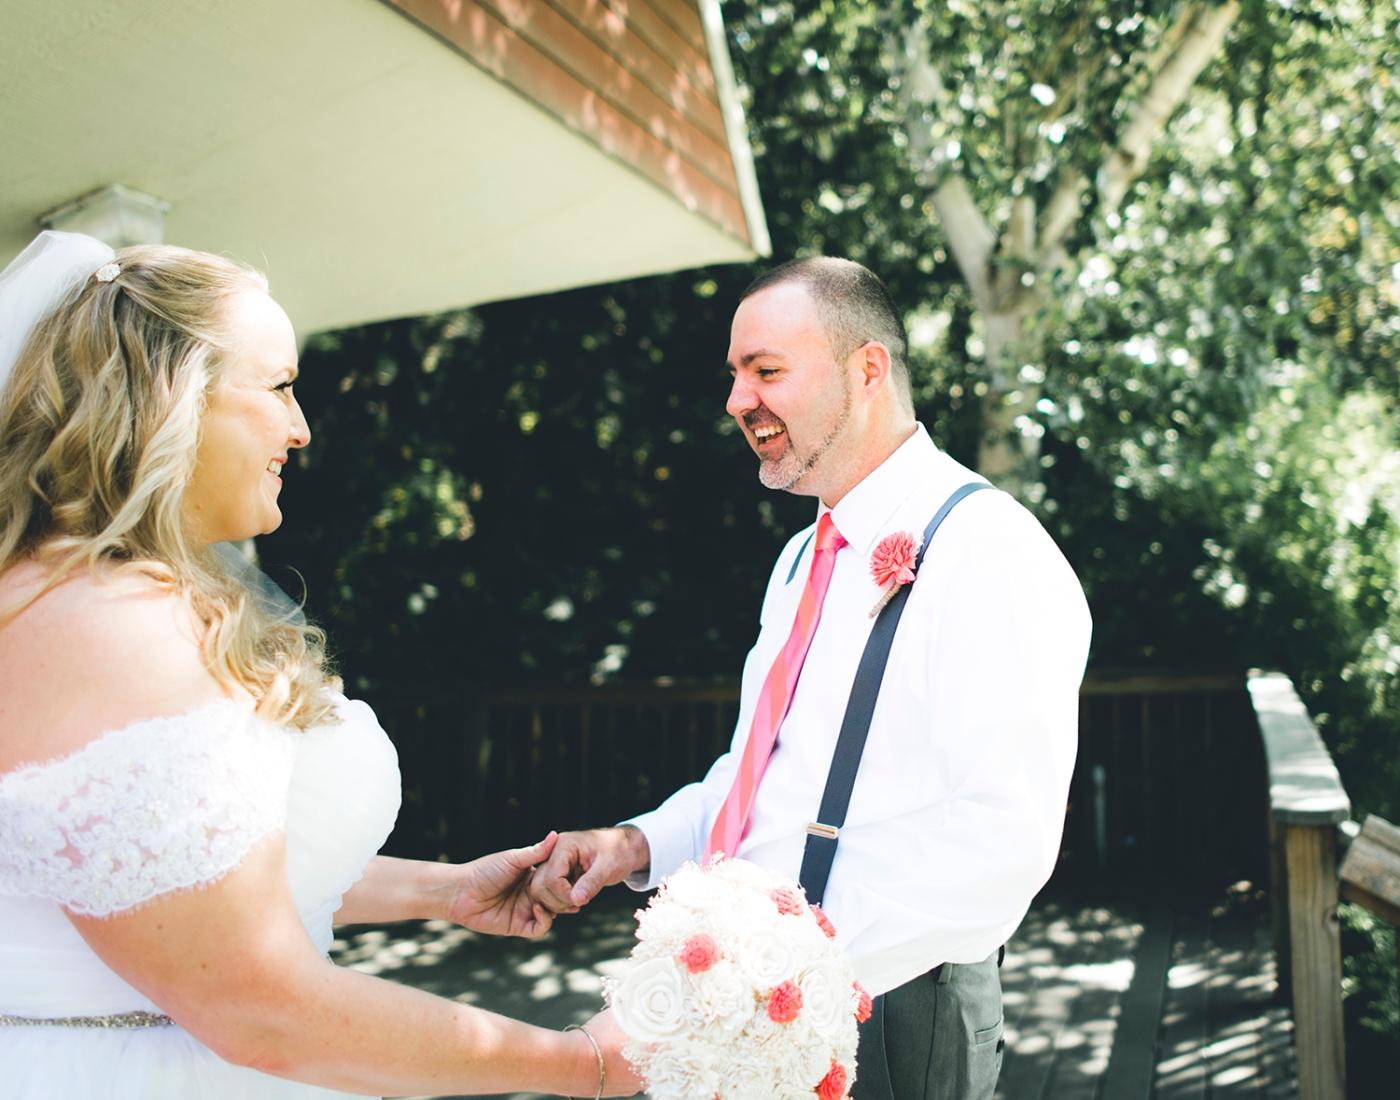 Jane_S_photography_Kadie_and_Steve_2016_Des_Moines_Marina_WeddingDSC_1514